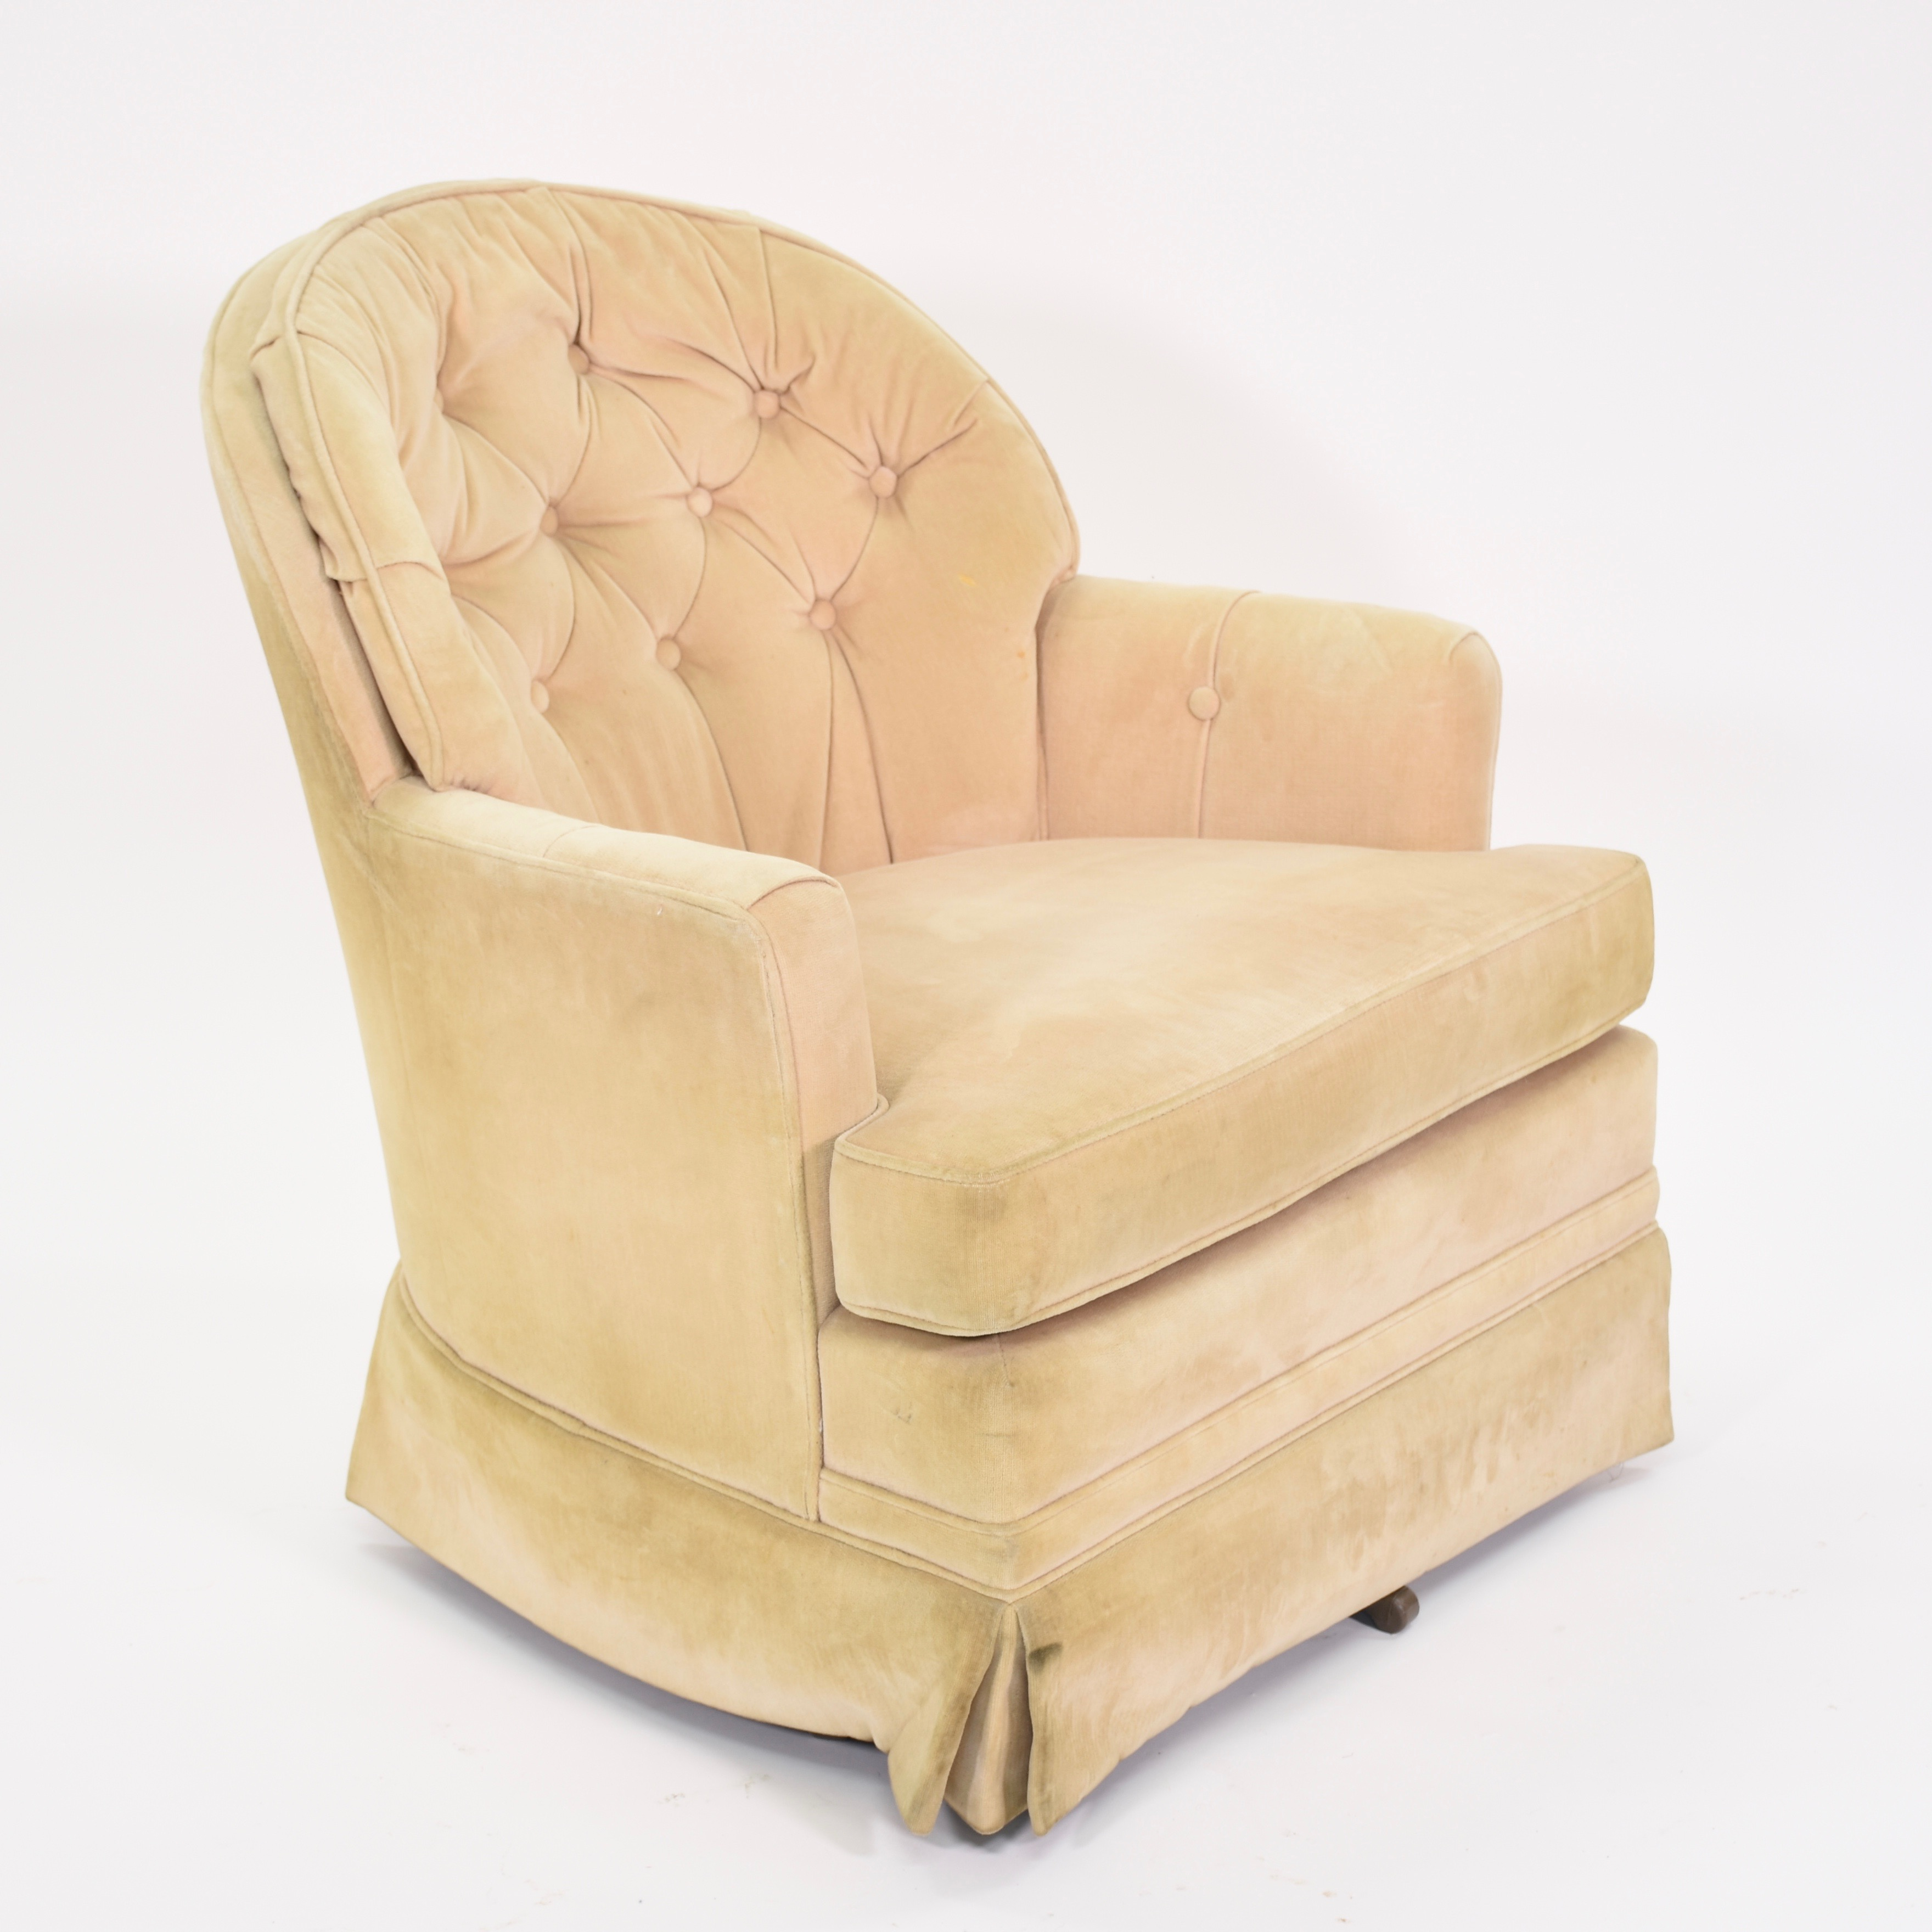 cream club chair foot massage upholstered swivel loveseat vintage